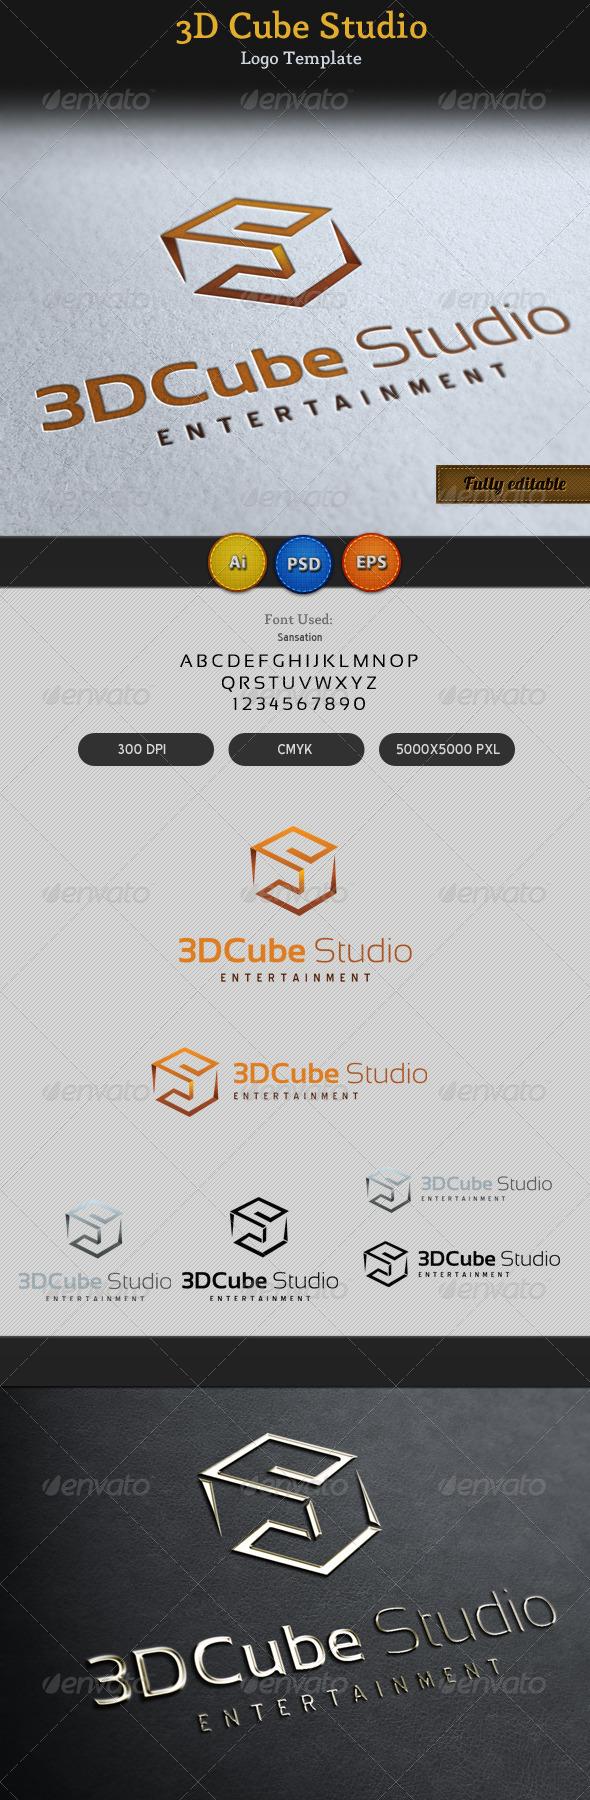 3D Cube Studio Entertainment Media Logo - 3d Abstract